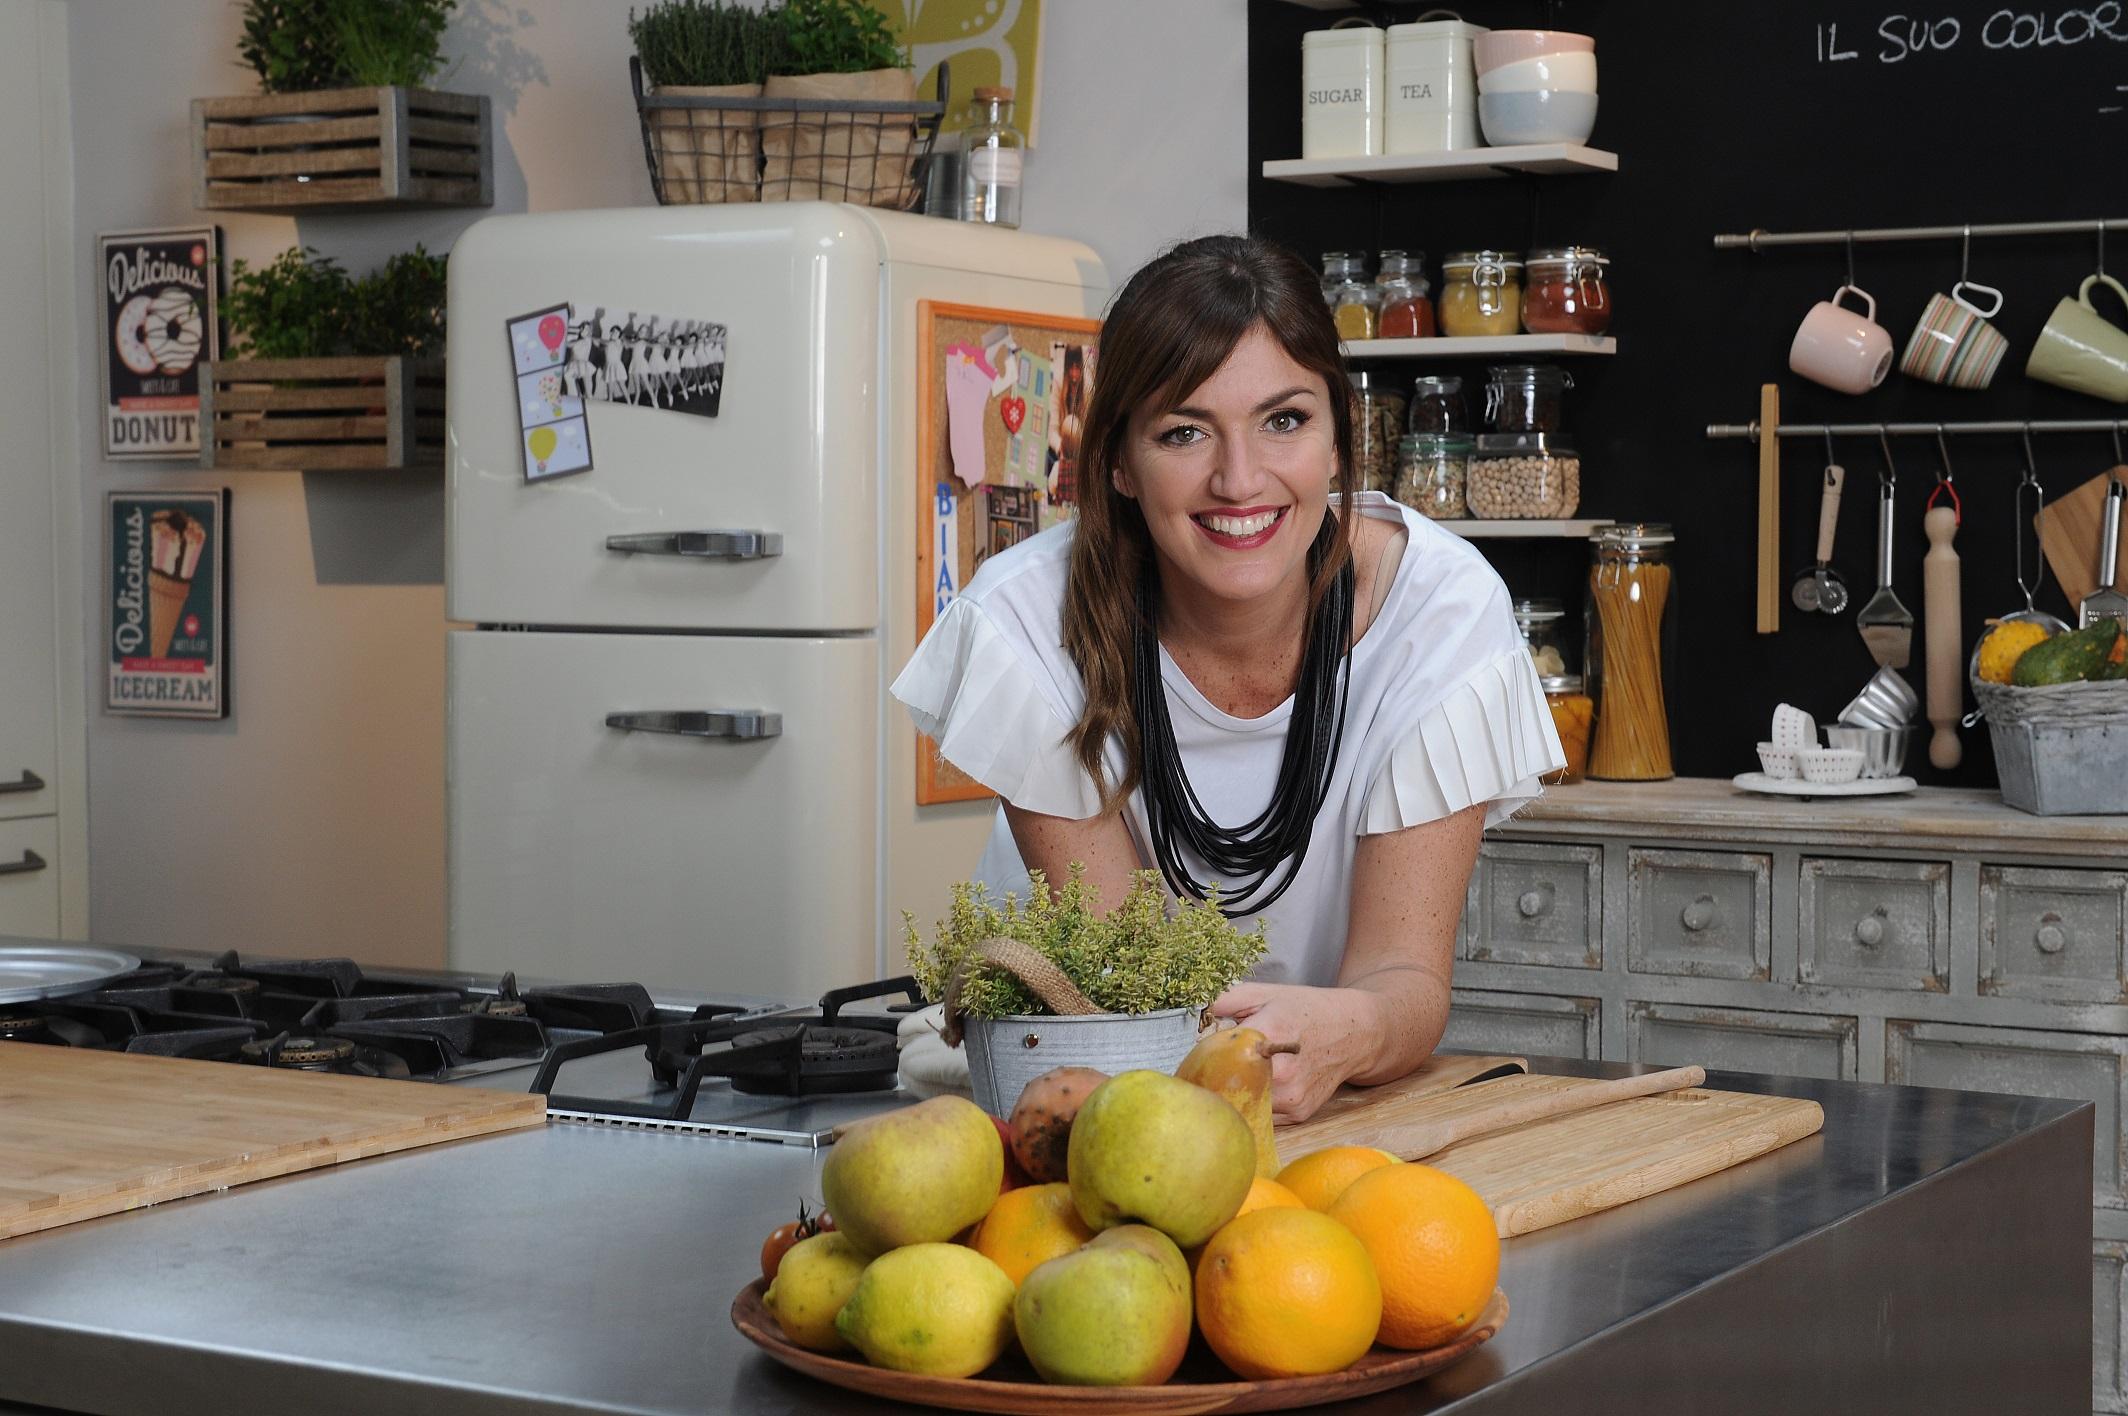 Chiara maci consigli per natale diredonna - Chiara blogger cucina ...